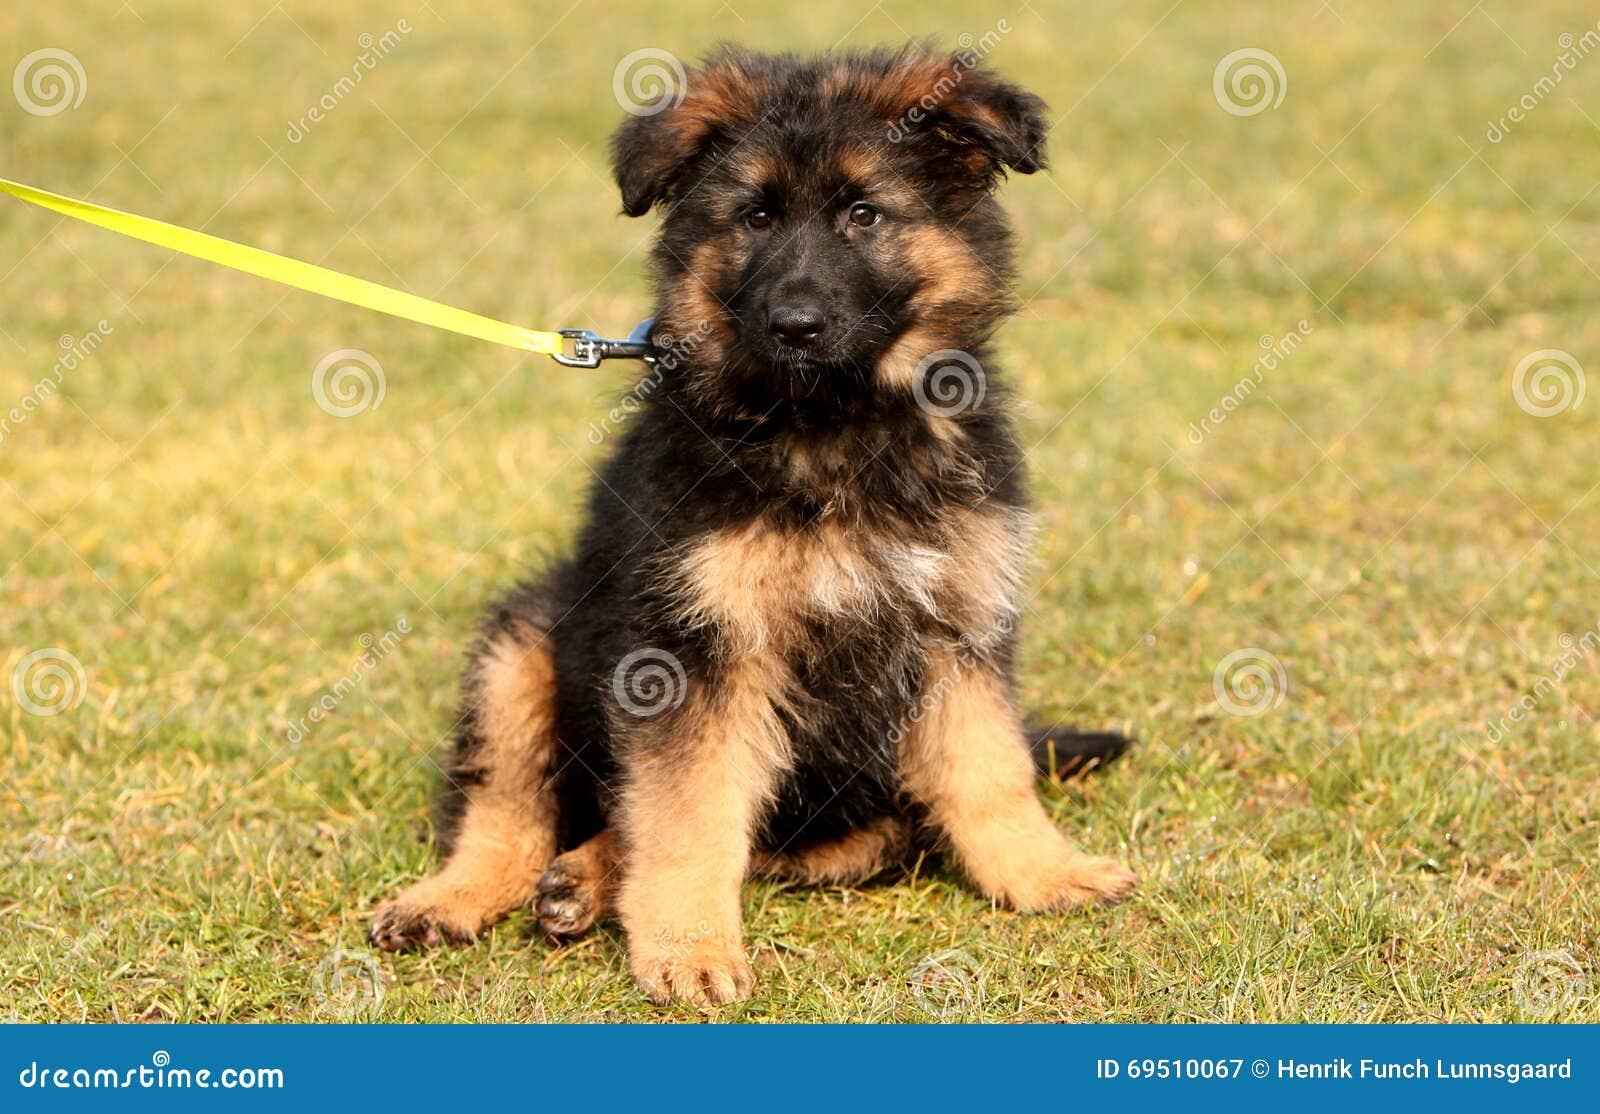 Big Black Wooly Dog